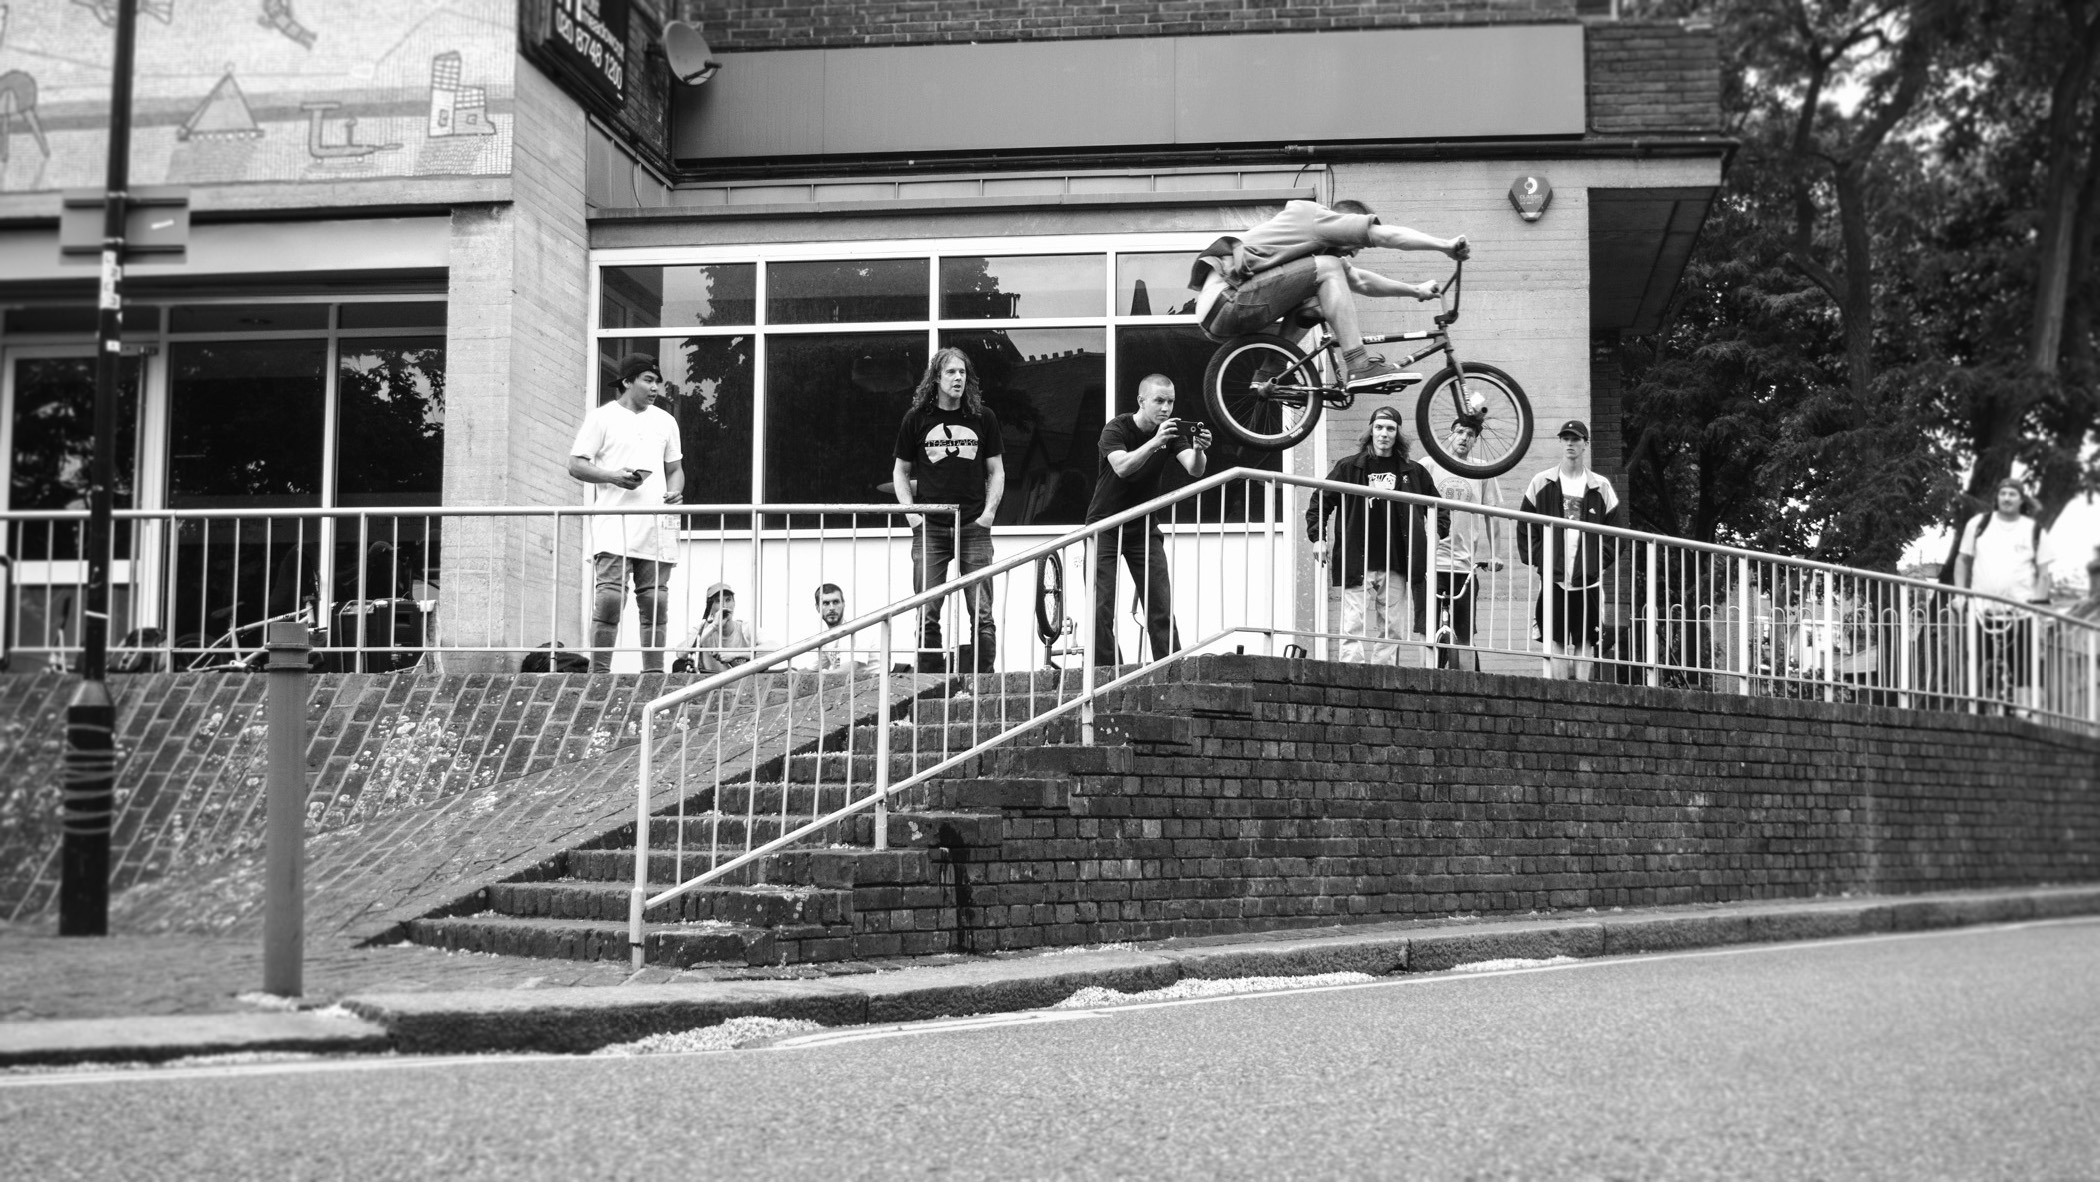 METAL PEGS: London BMX Jam #4